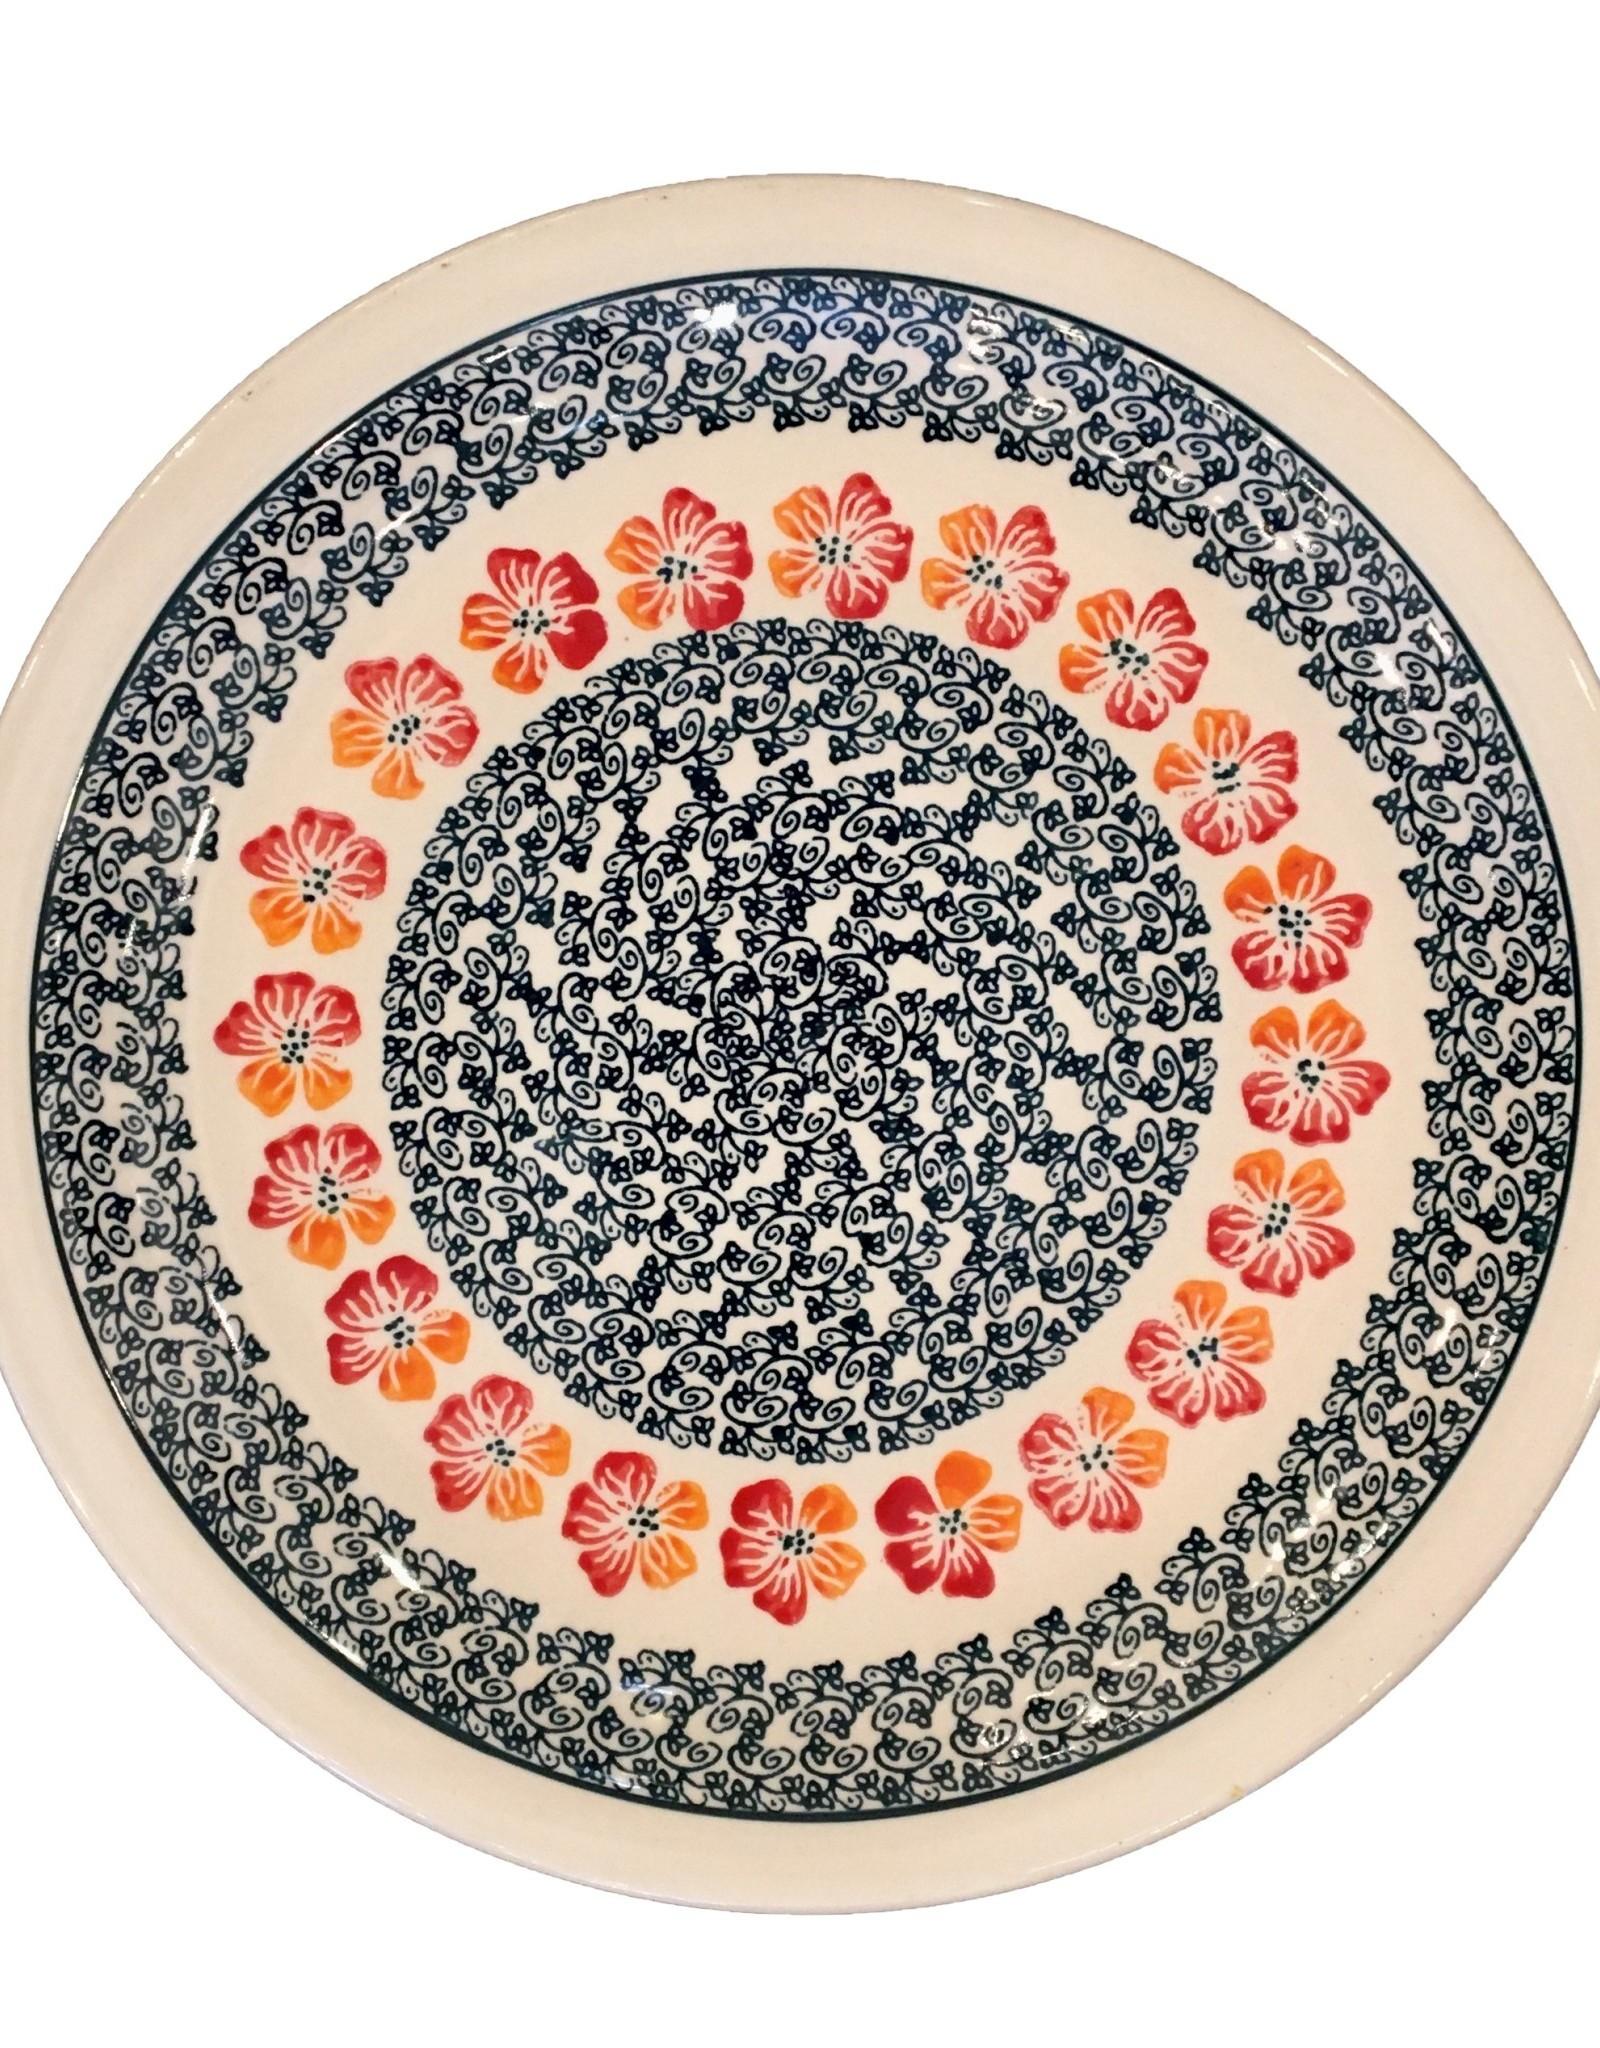 Dinner Plate - Flowers